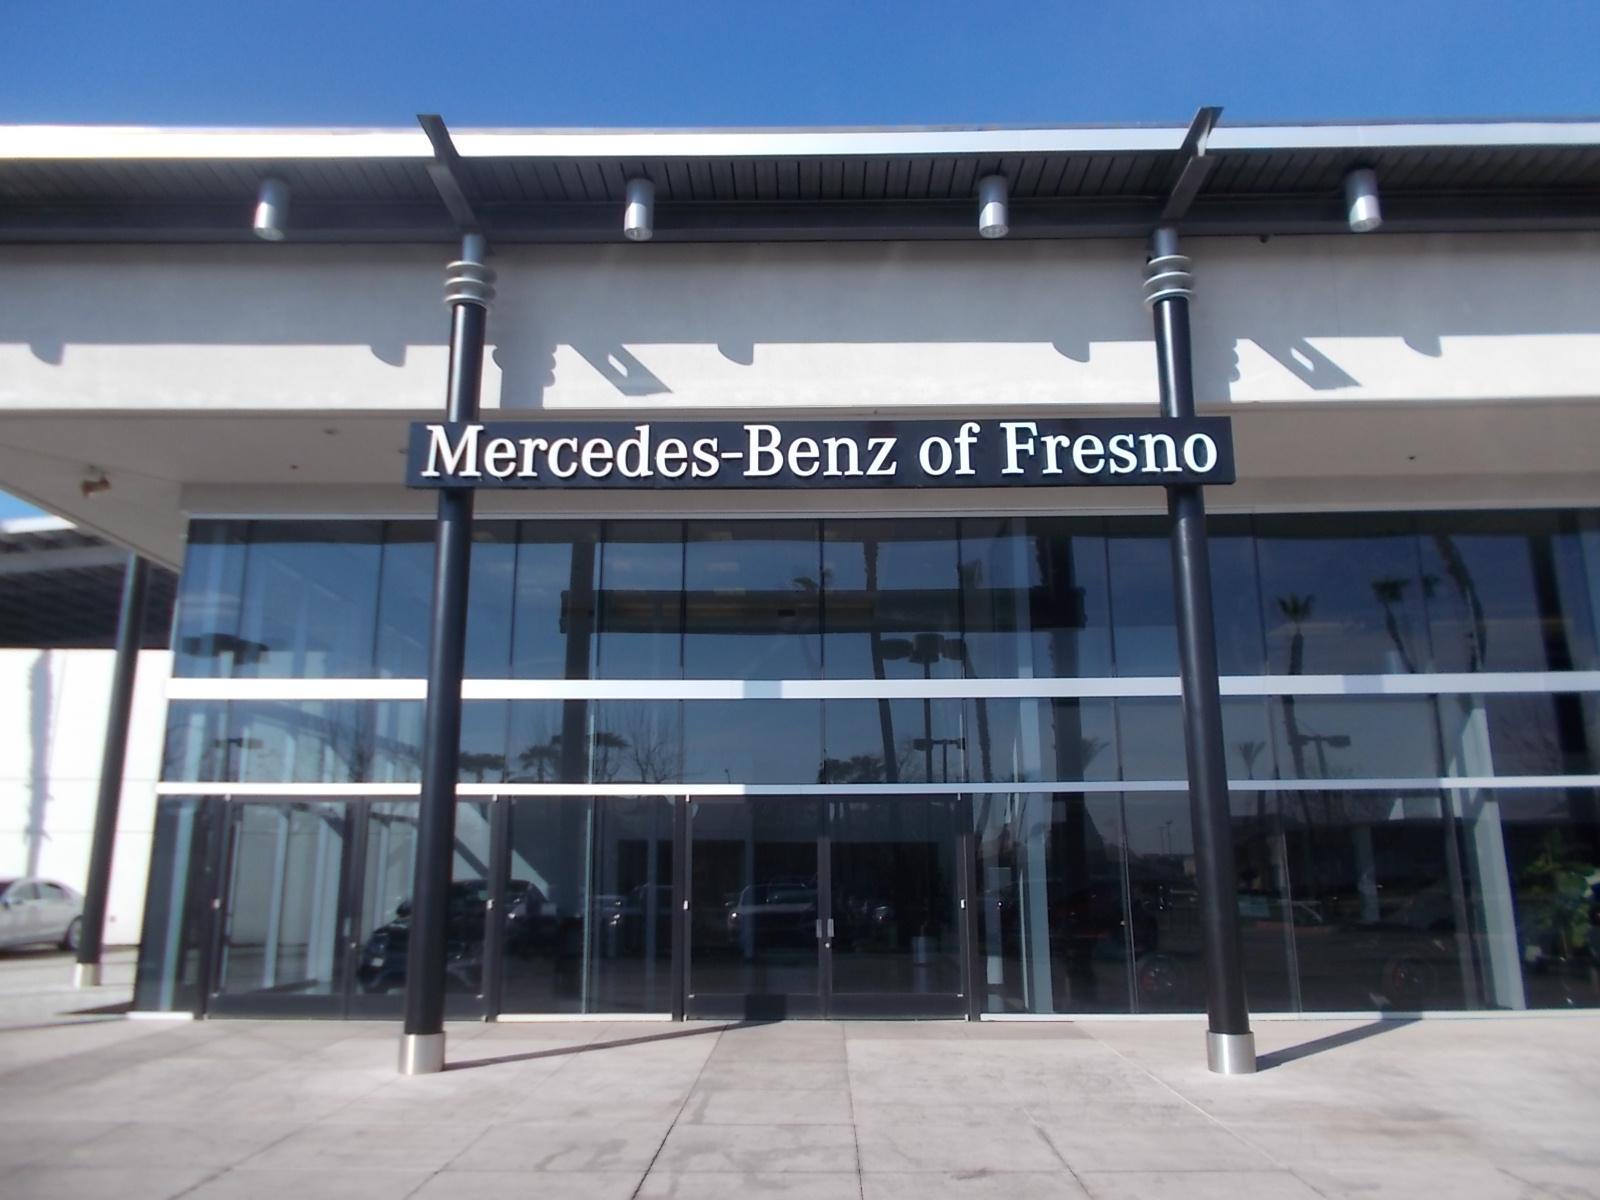 Mercedes-Benz Fresno